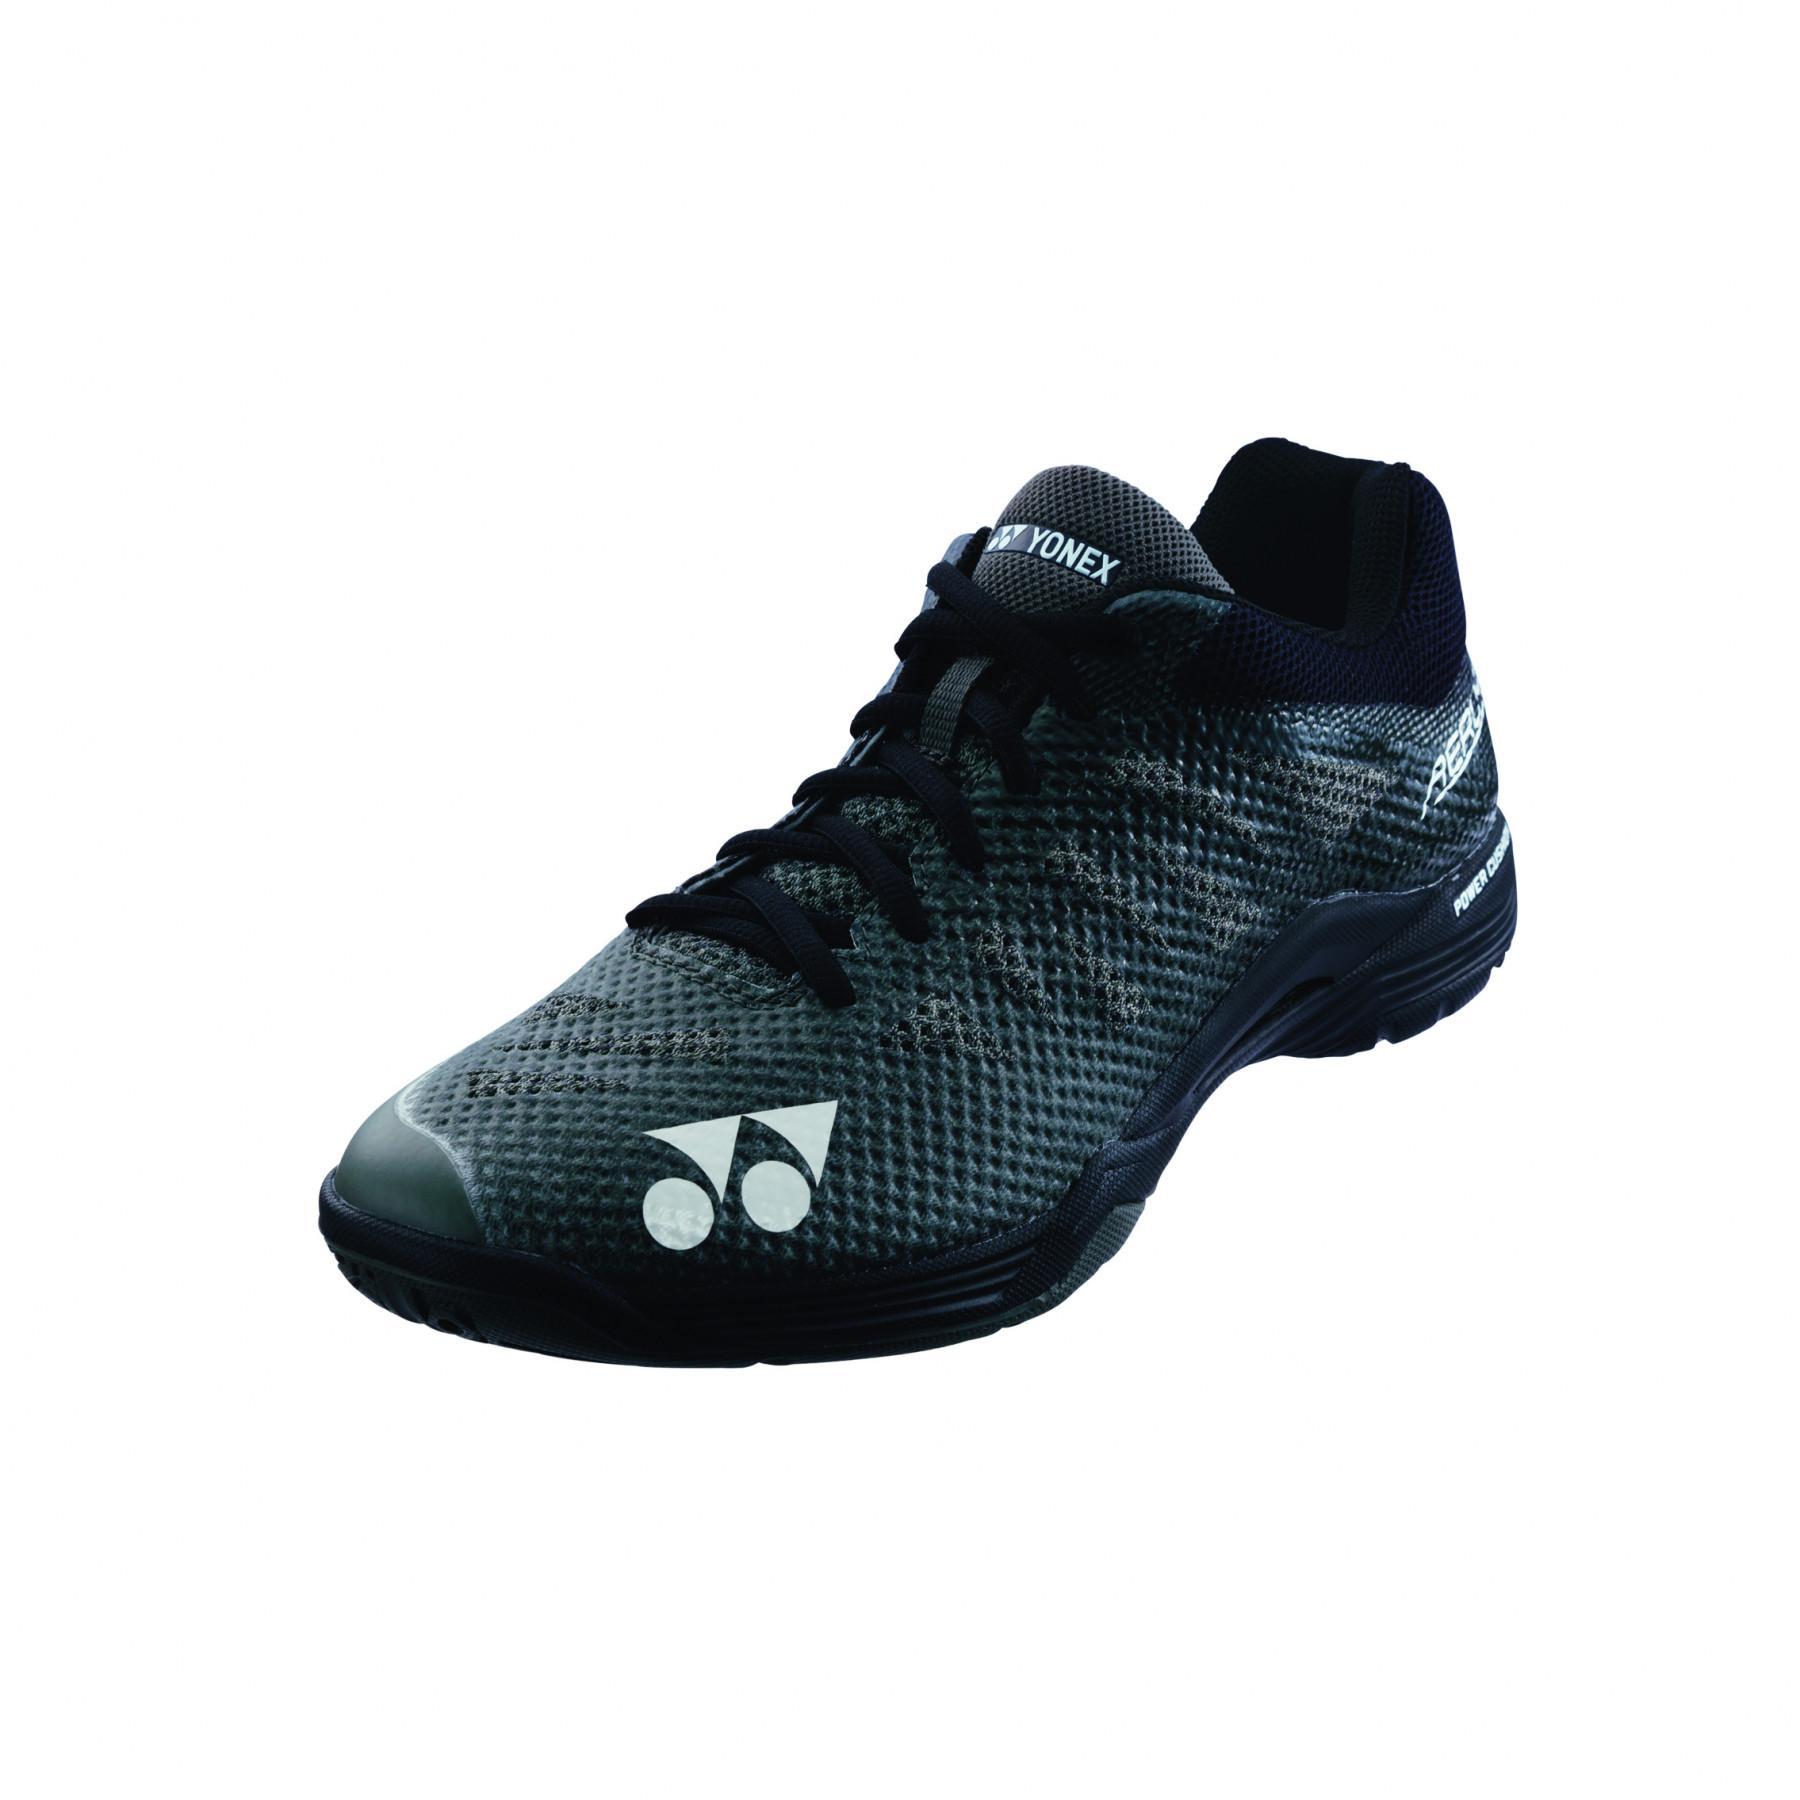 Shoes Yonex power cushion aerus 3 men